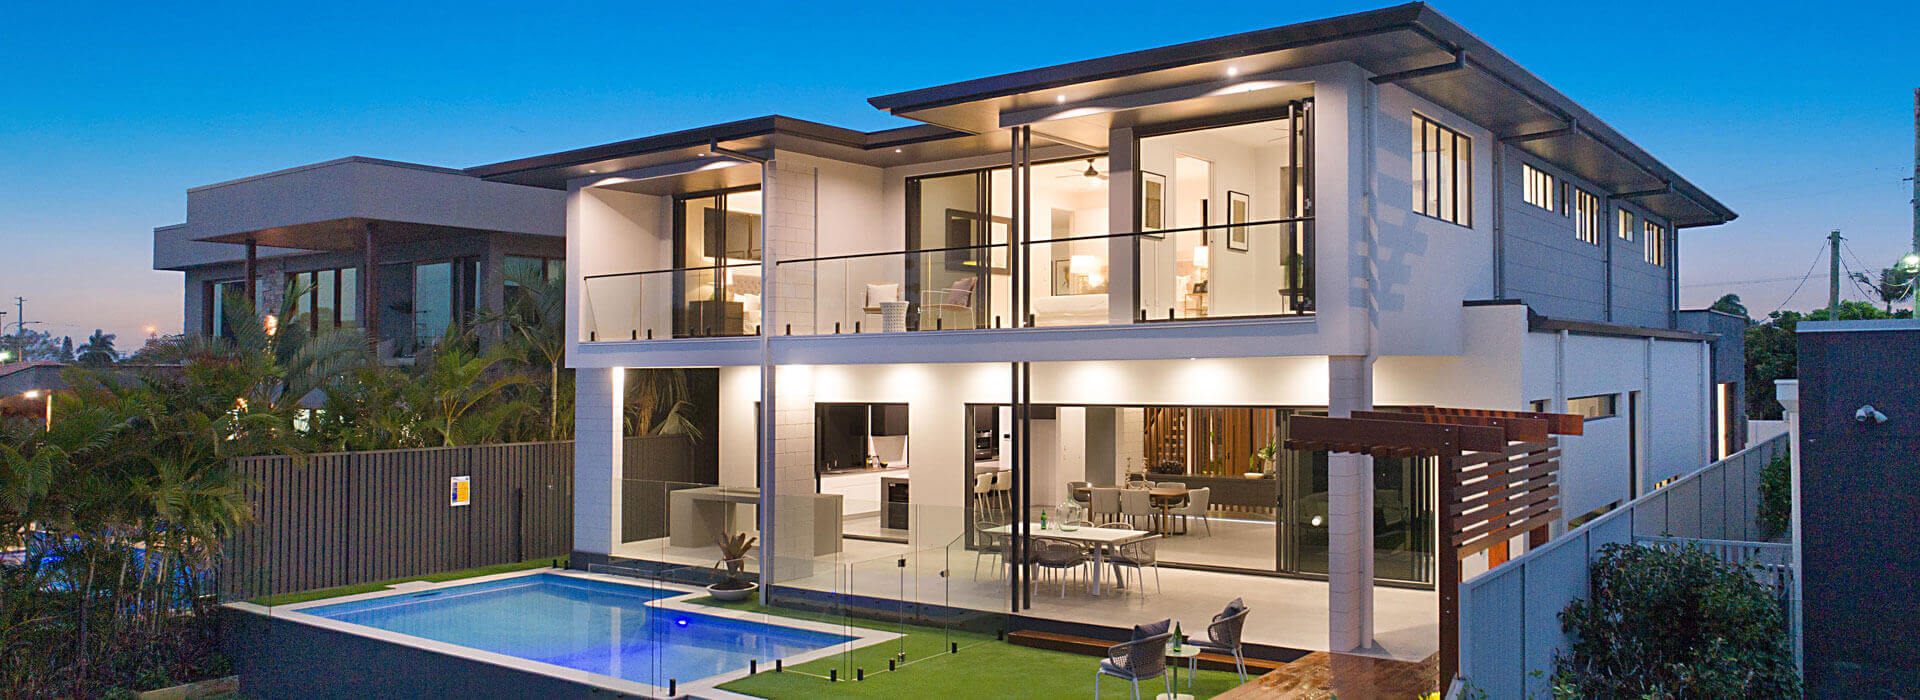 Home Renovation Company in Sunshine Coast